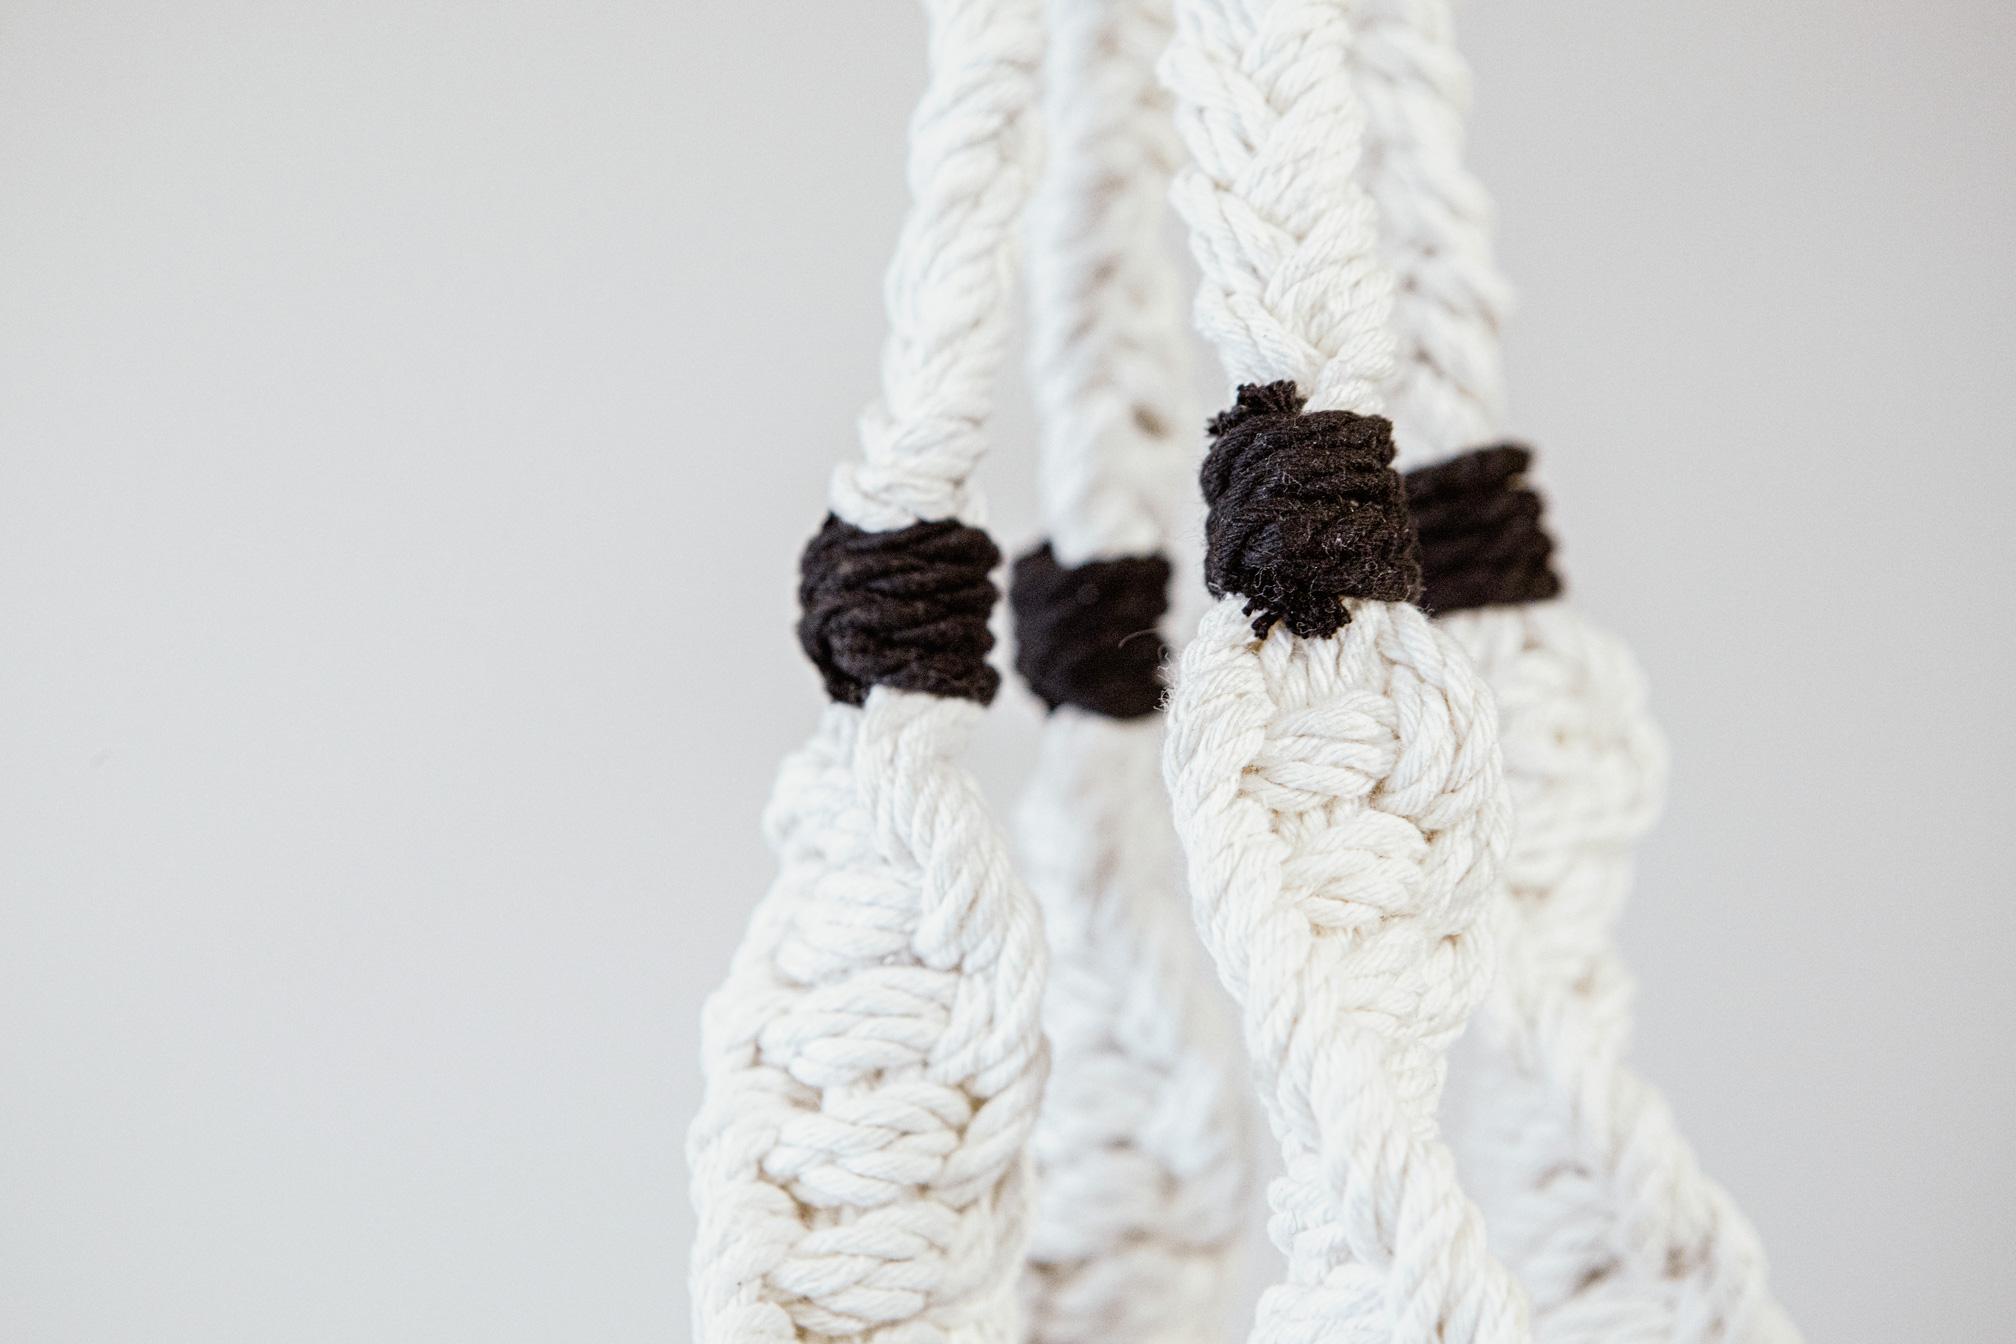 Detalle de macetero artesanal de macramé fabricado en algodón ecológico en color crudo con detalles negros